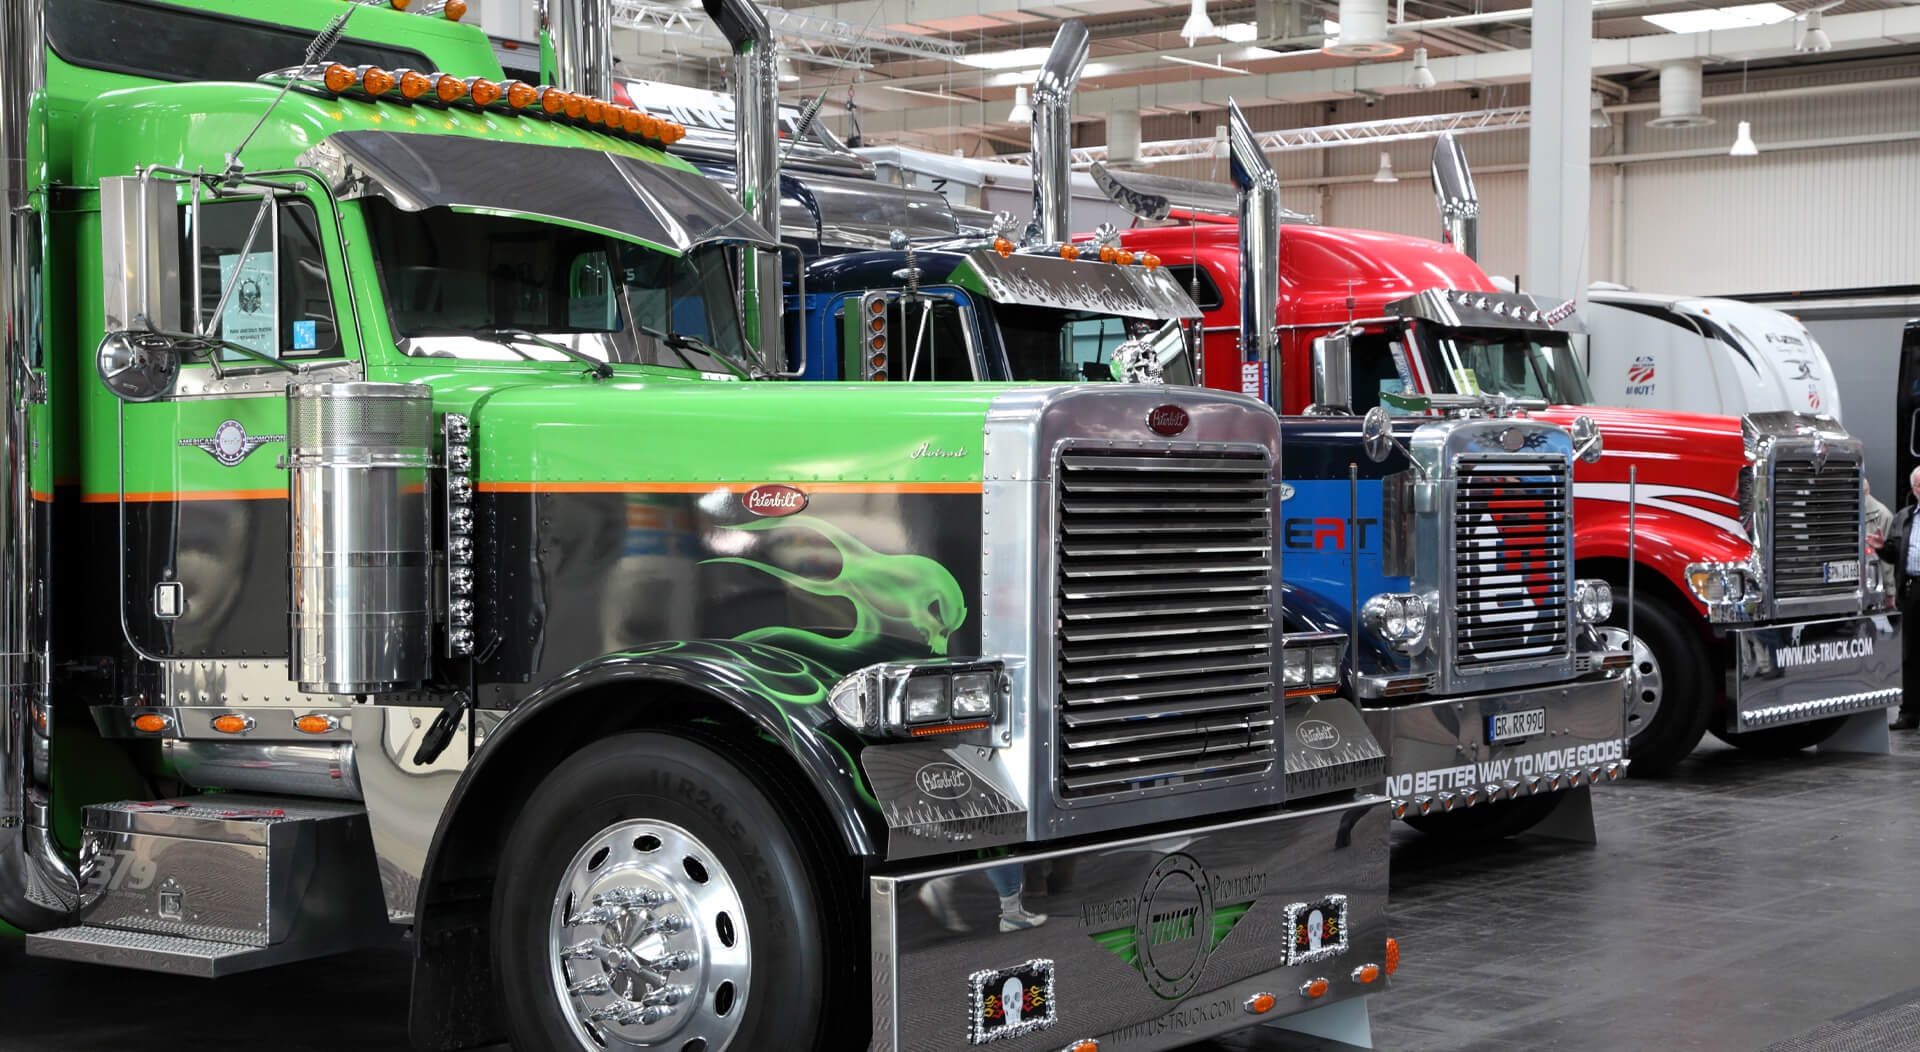 peterbilt trucks displayed at an auto show